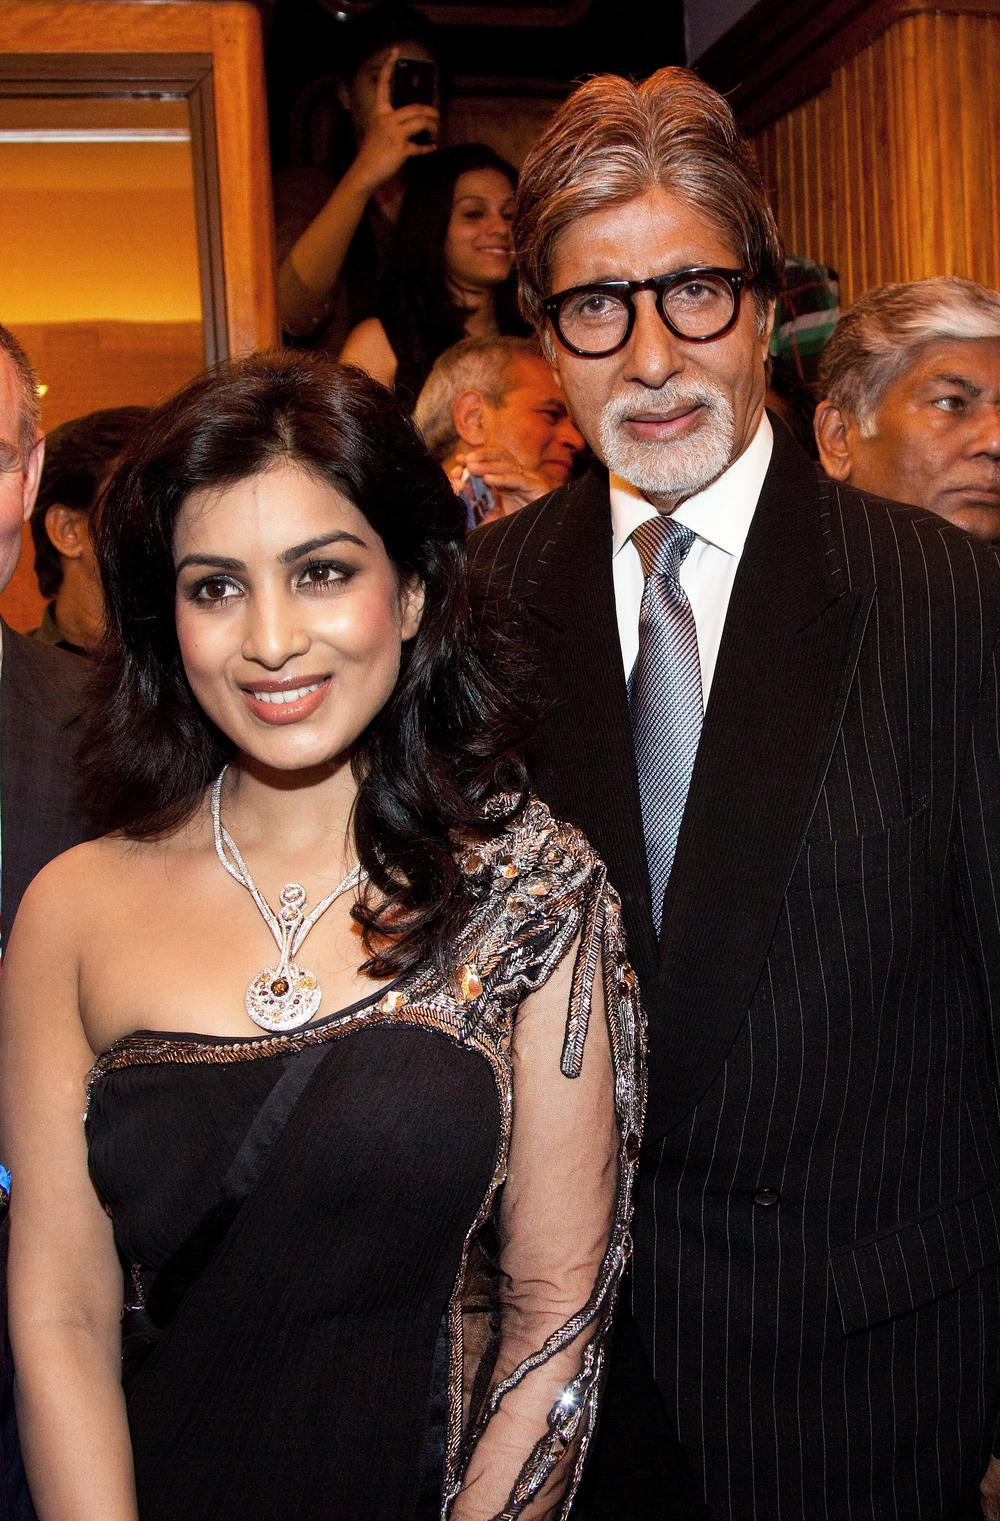 Reena Ahluwalia_Amitabh Bachchan_Pallavi Sharda_Rio Tinto Bunder Diamonds.JPG